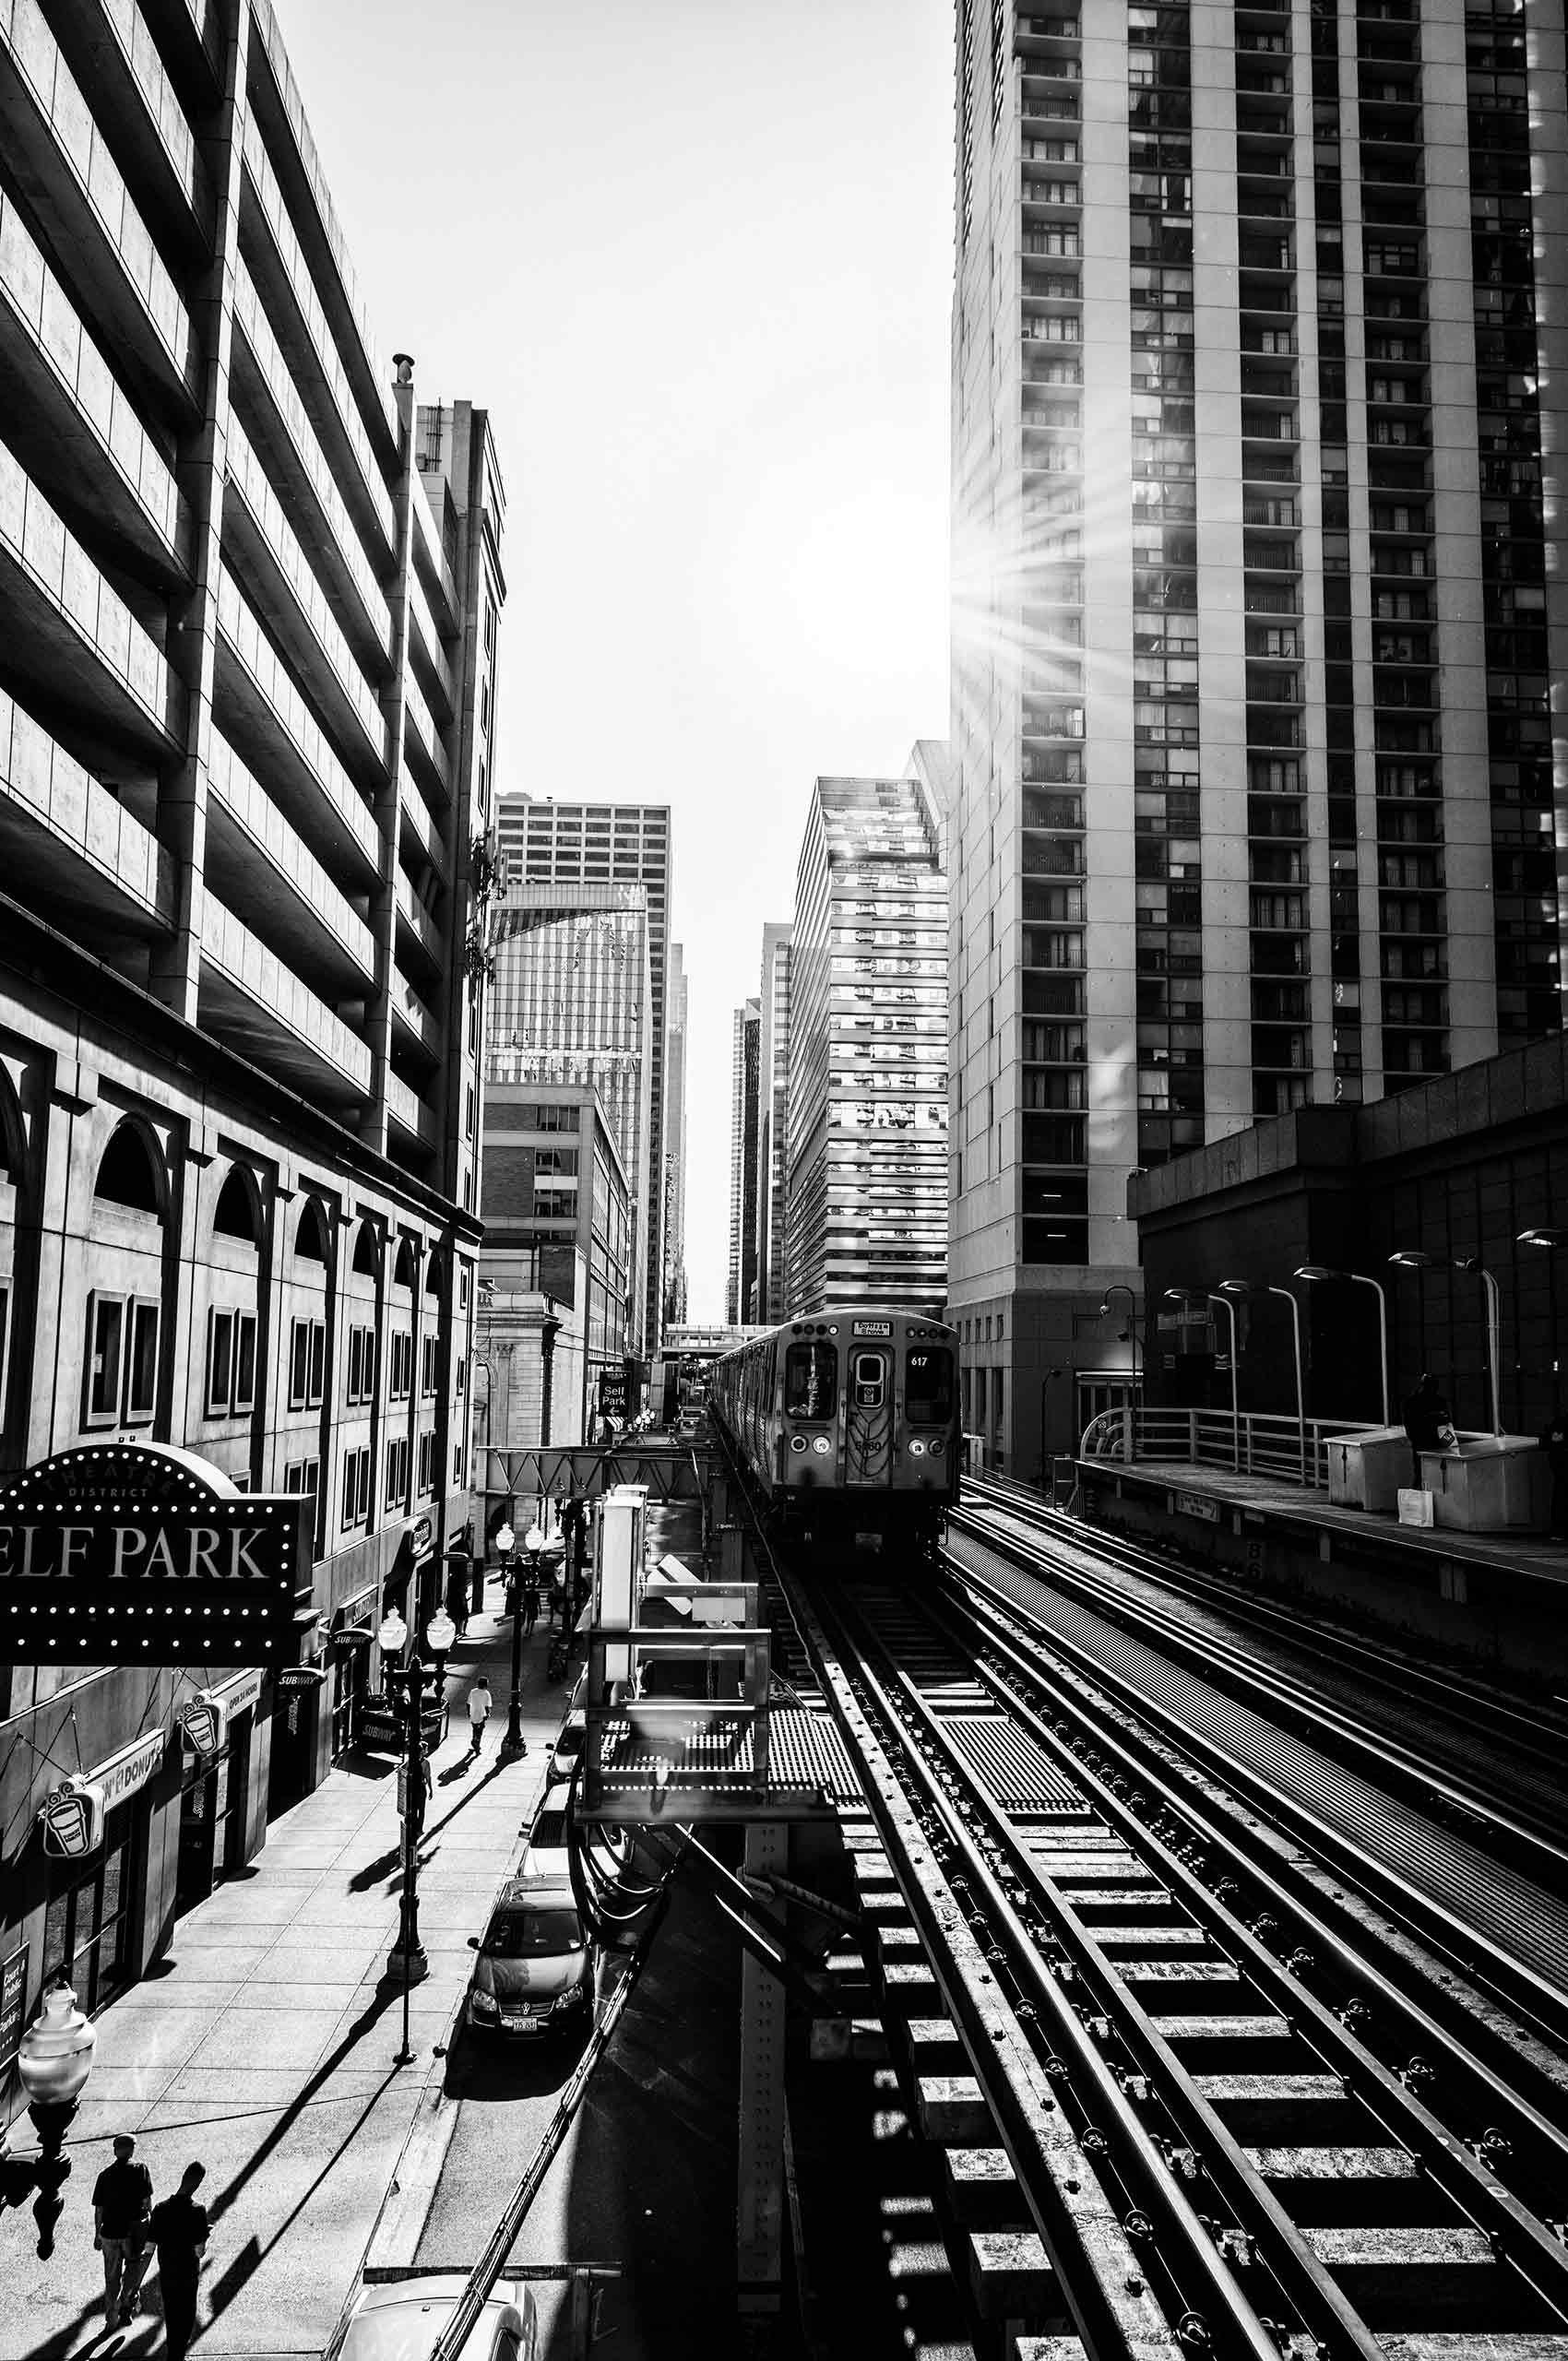 AbovegroundSubway-Chicago-by-HenrikOlundPhotography.jpg